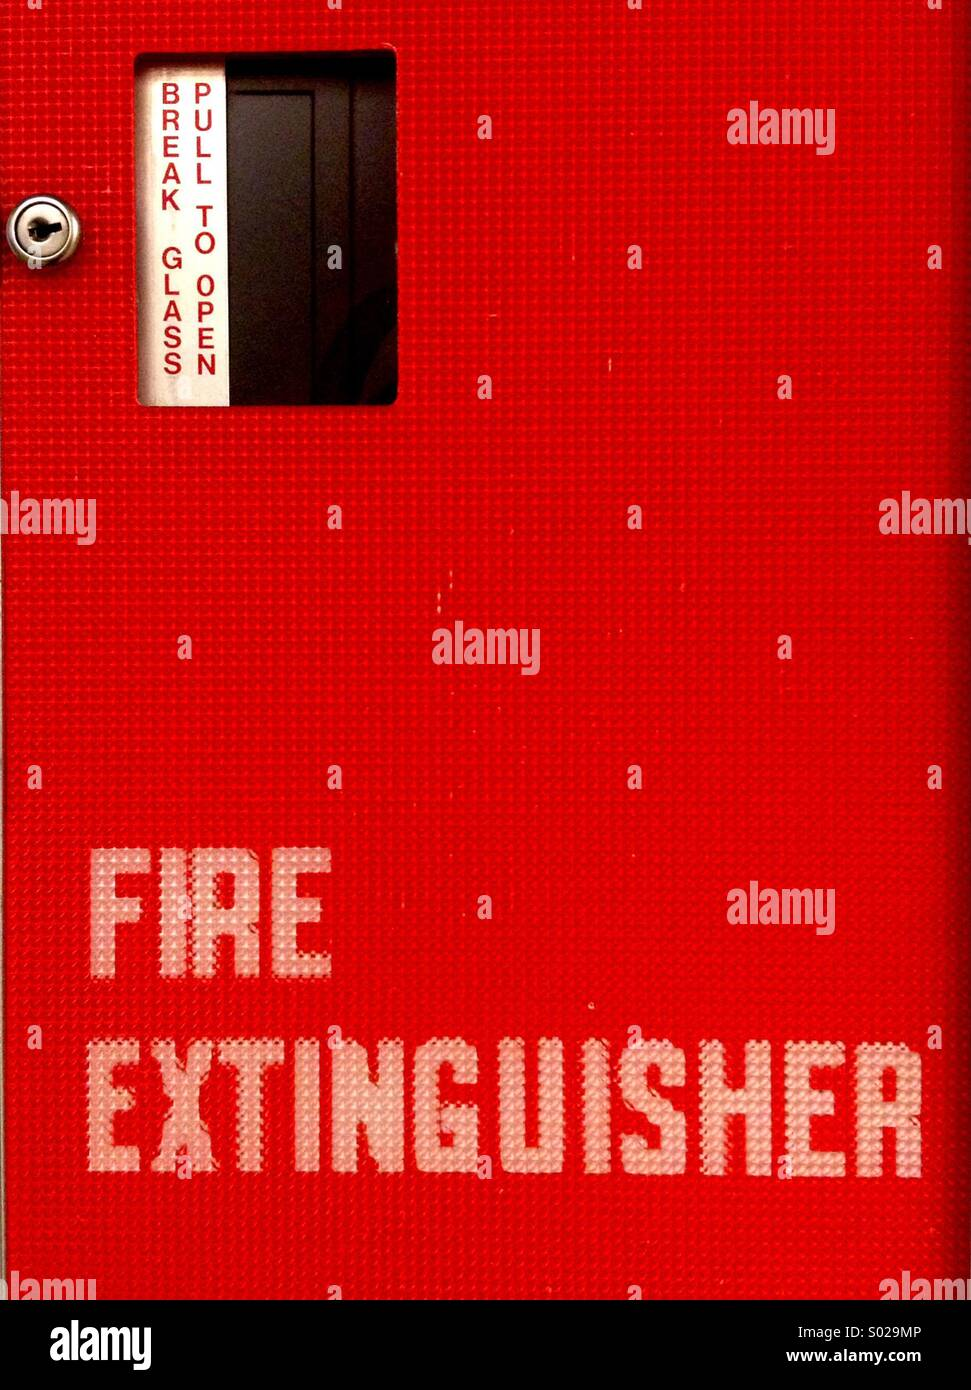 Fire extinguisher. Break to open. - Stock Image